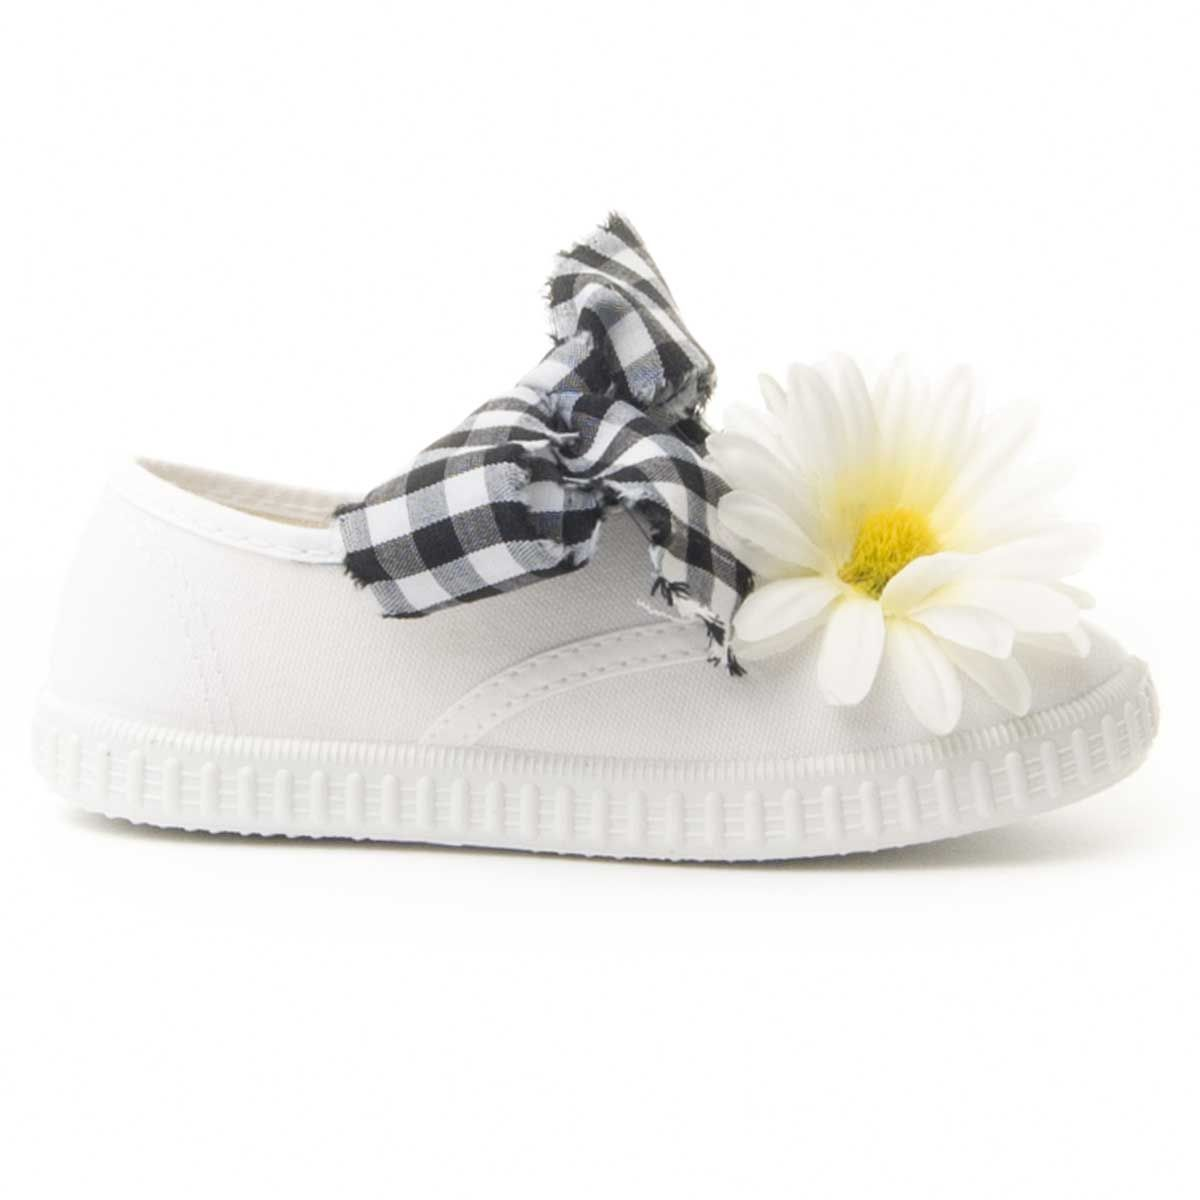 Maria Graor Floral Sneaker in White